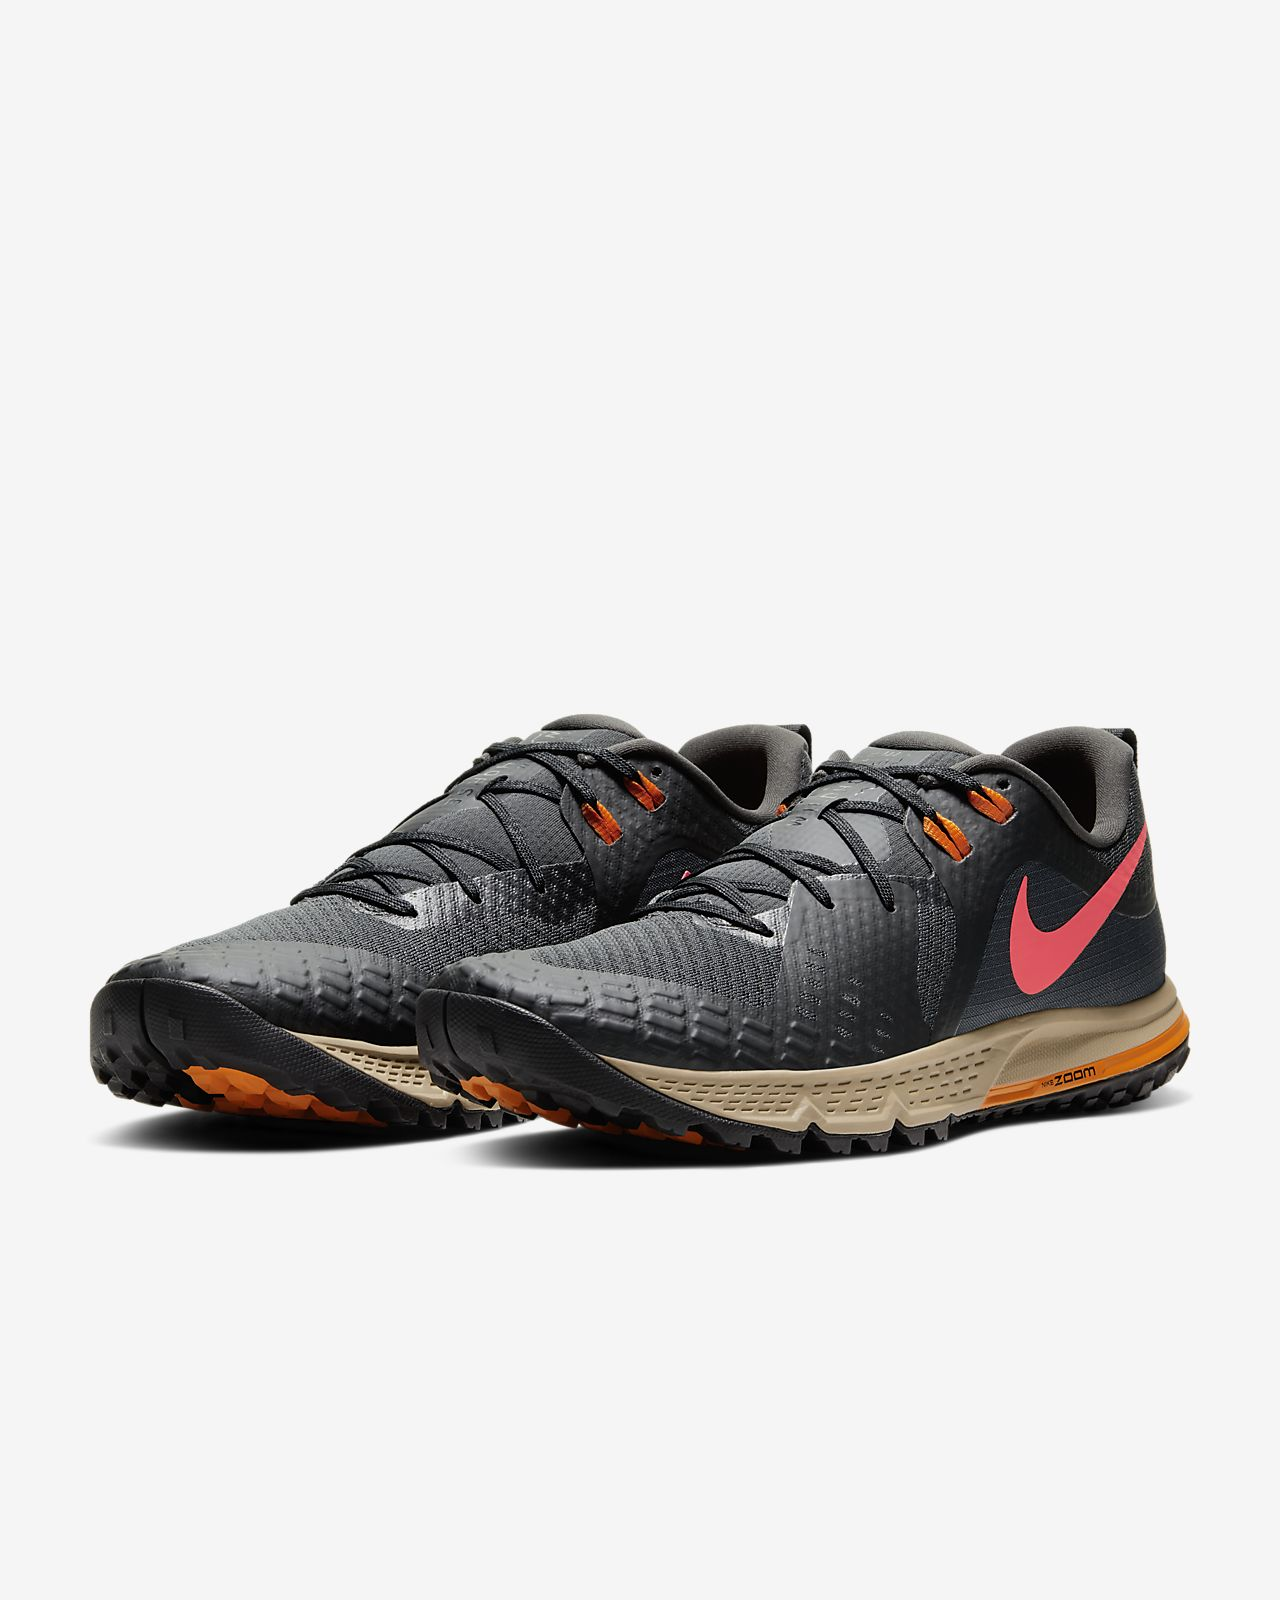 Online Nike Air Wild Férfi Utcai Cipő Rendelés Nike Cipő